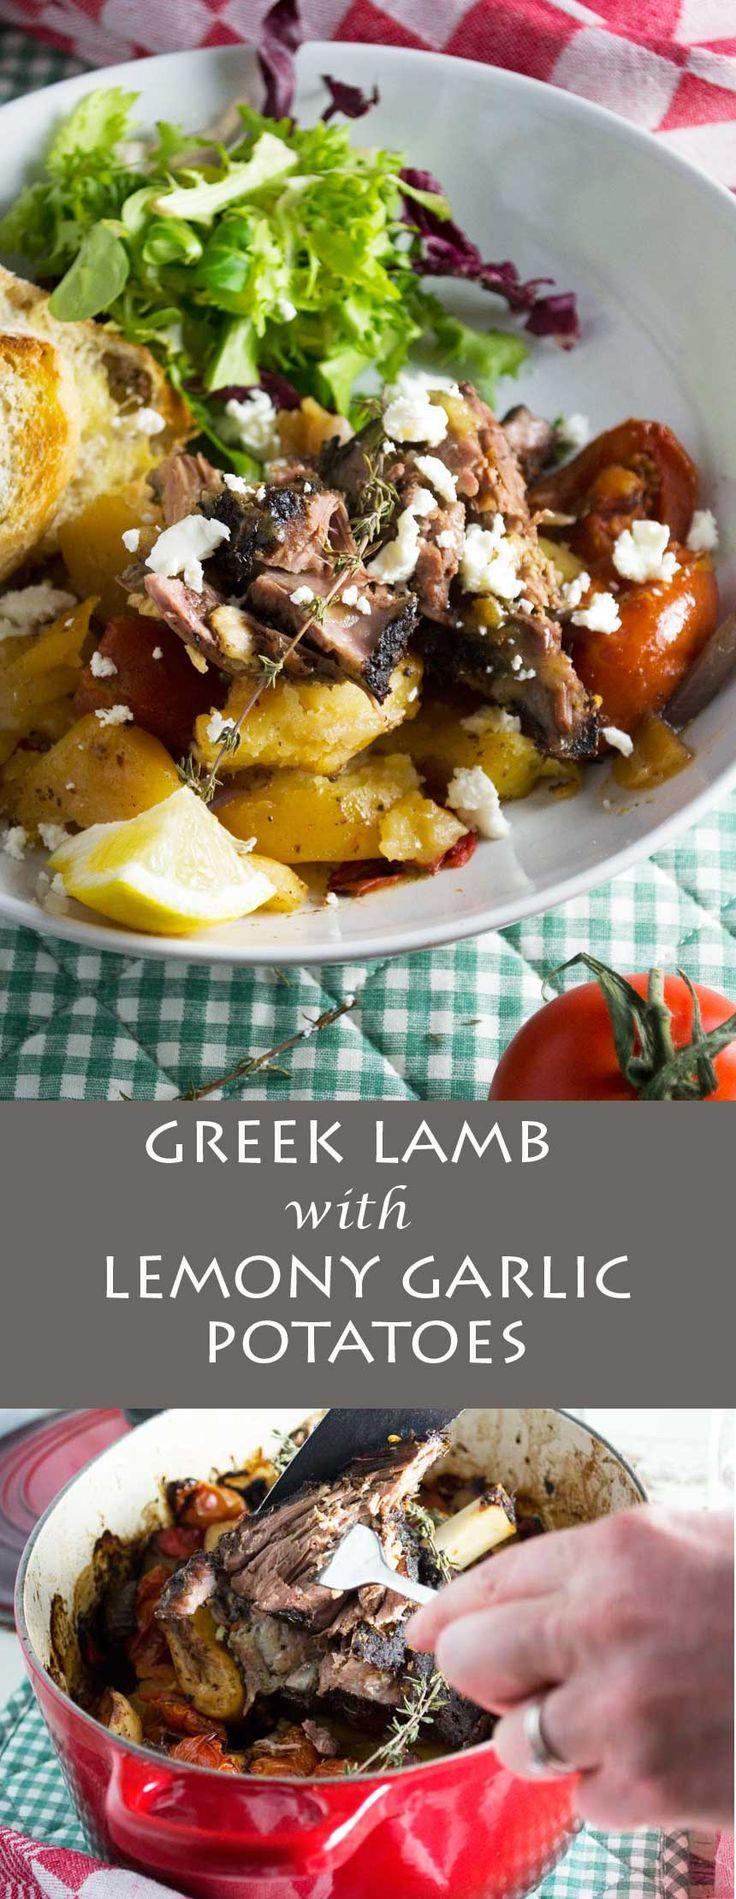 Greek lamb with lemony garlic potatoes (lamb kleftiko). Perfect for low maintenance (but impressive!) entertaining!